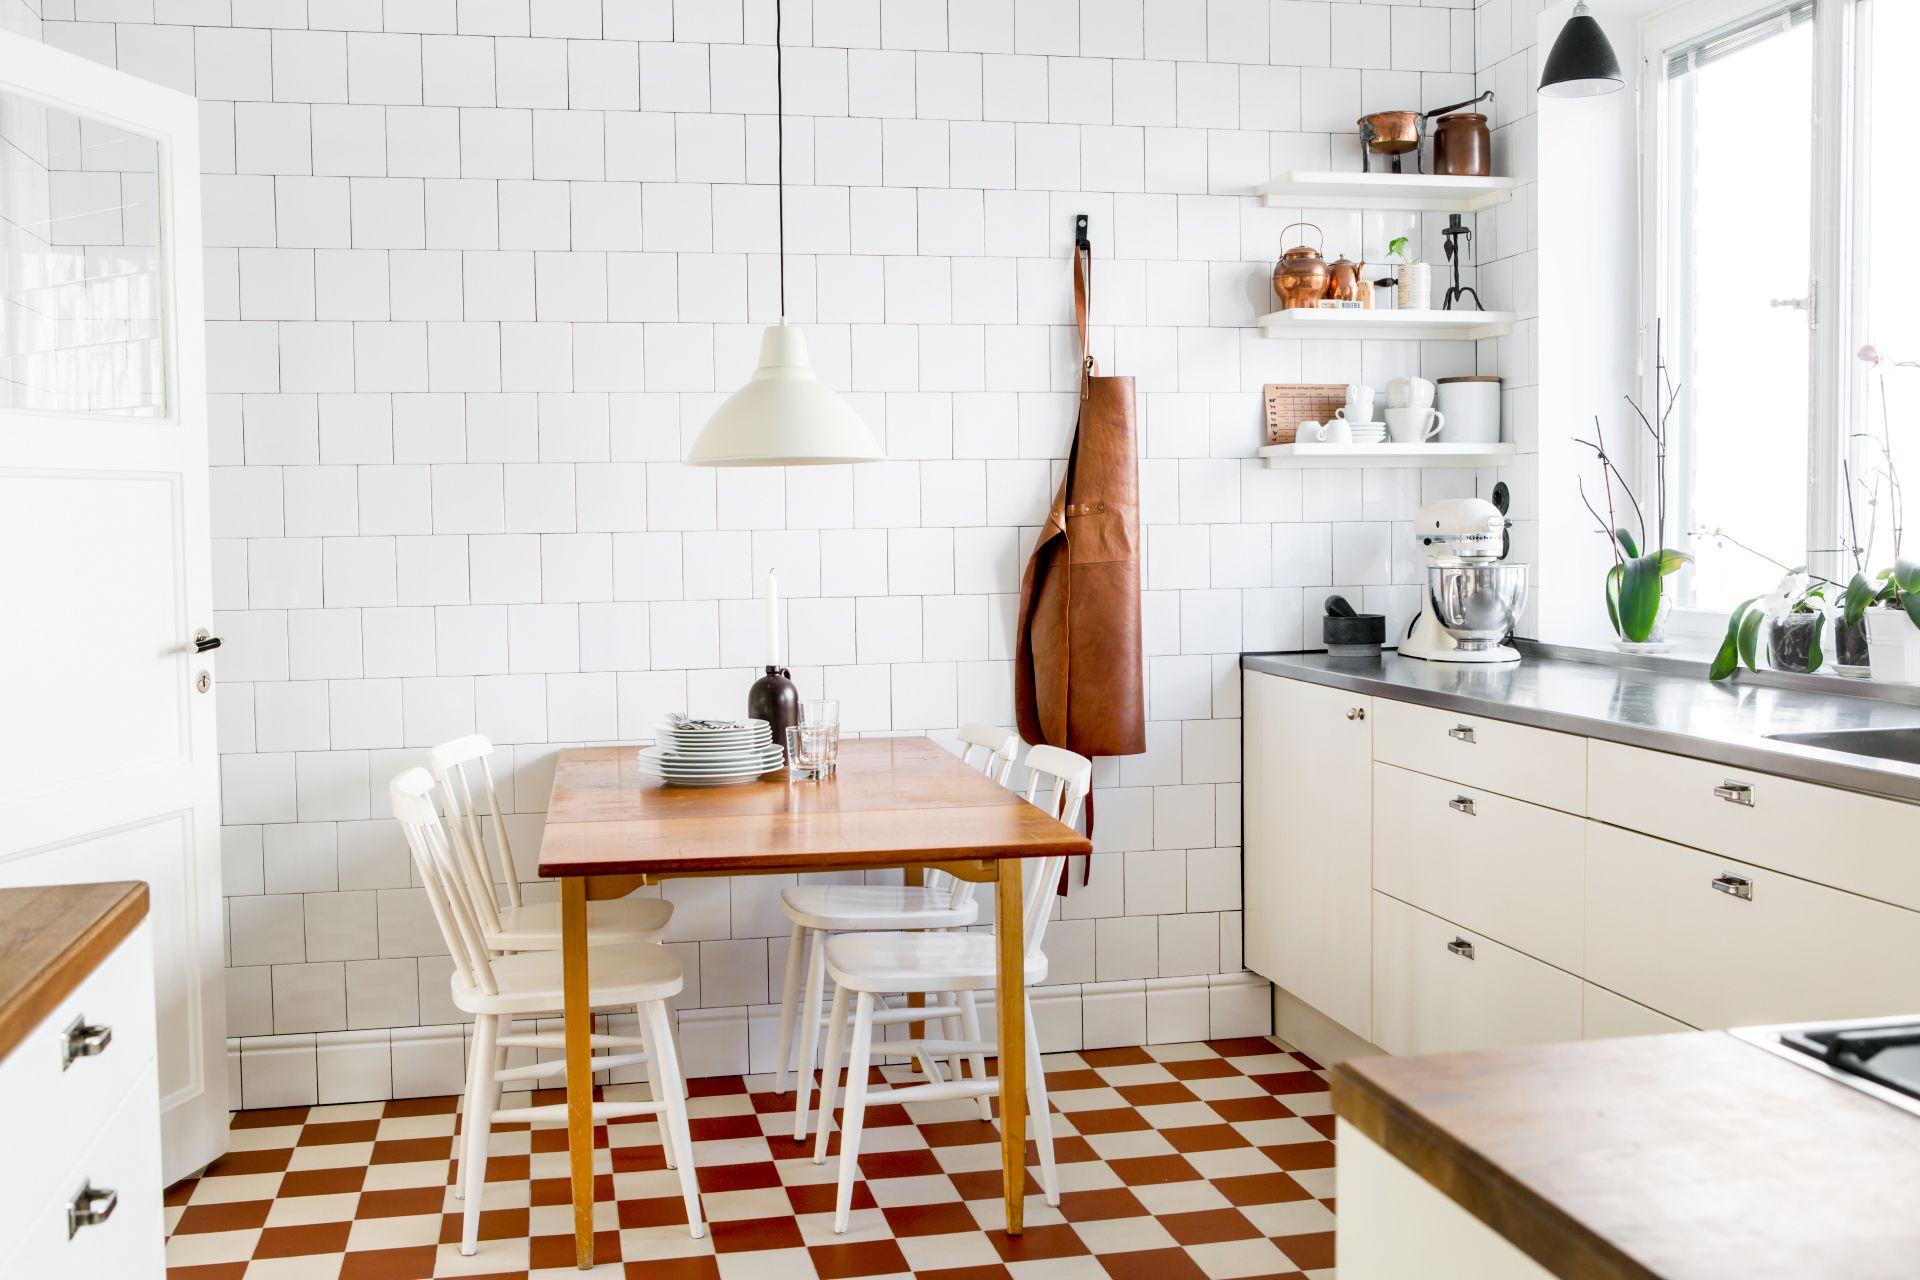 Utvalda / Selected Interiors 2015 #12